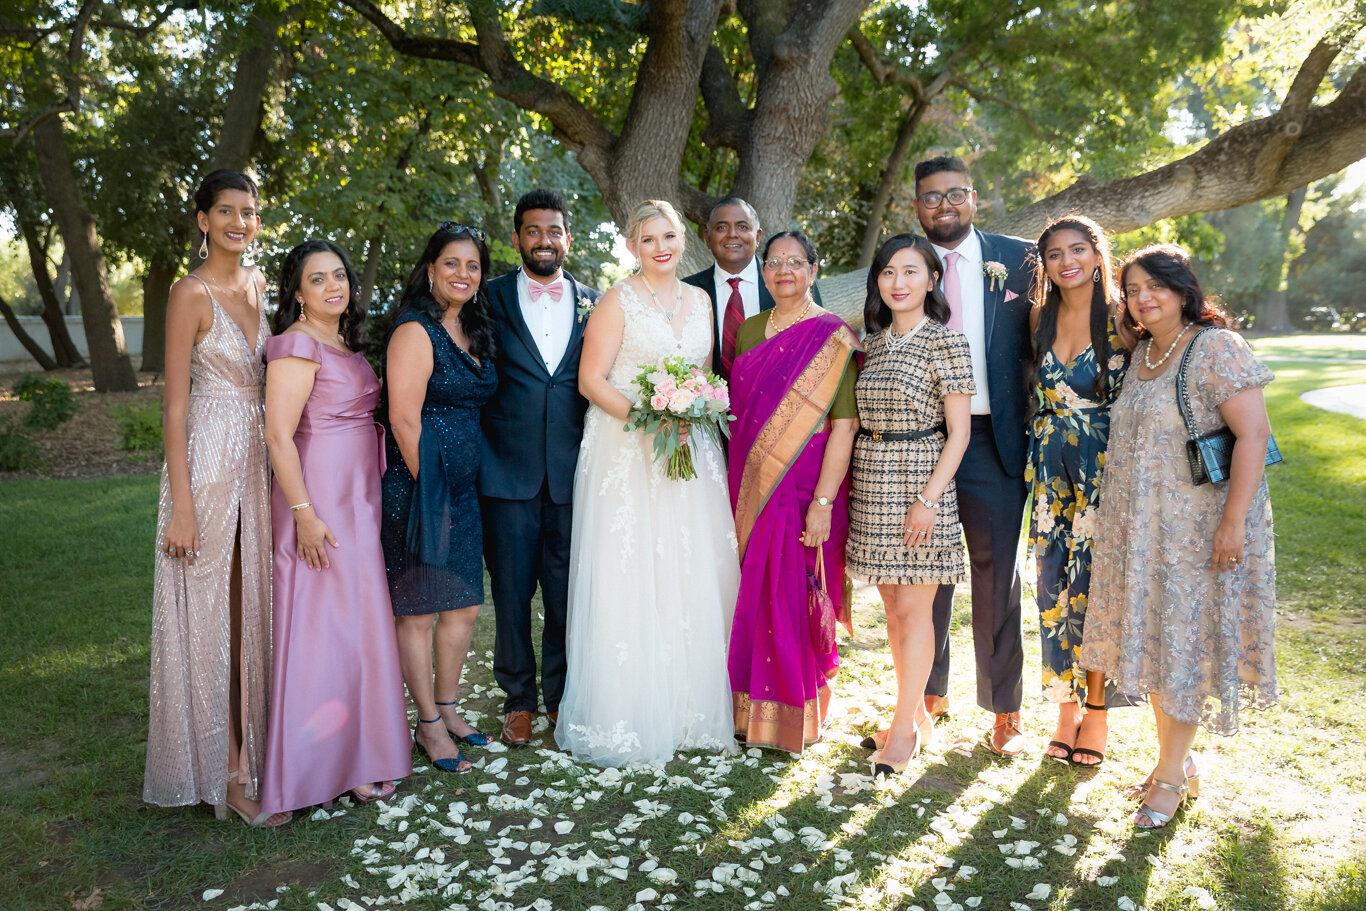 2019.08.24_Emily-Ashir-Wedding-at-the-Maples-5980.jpg